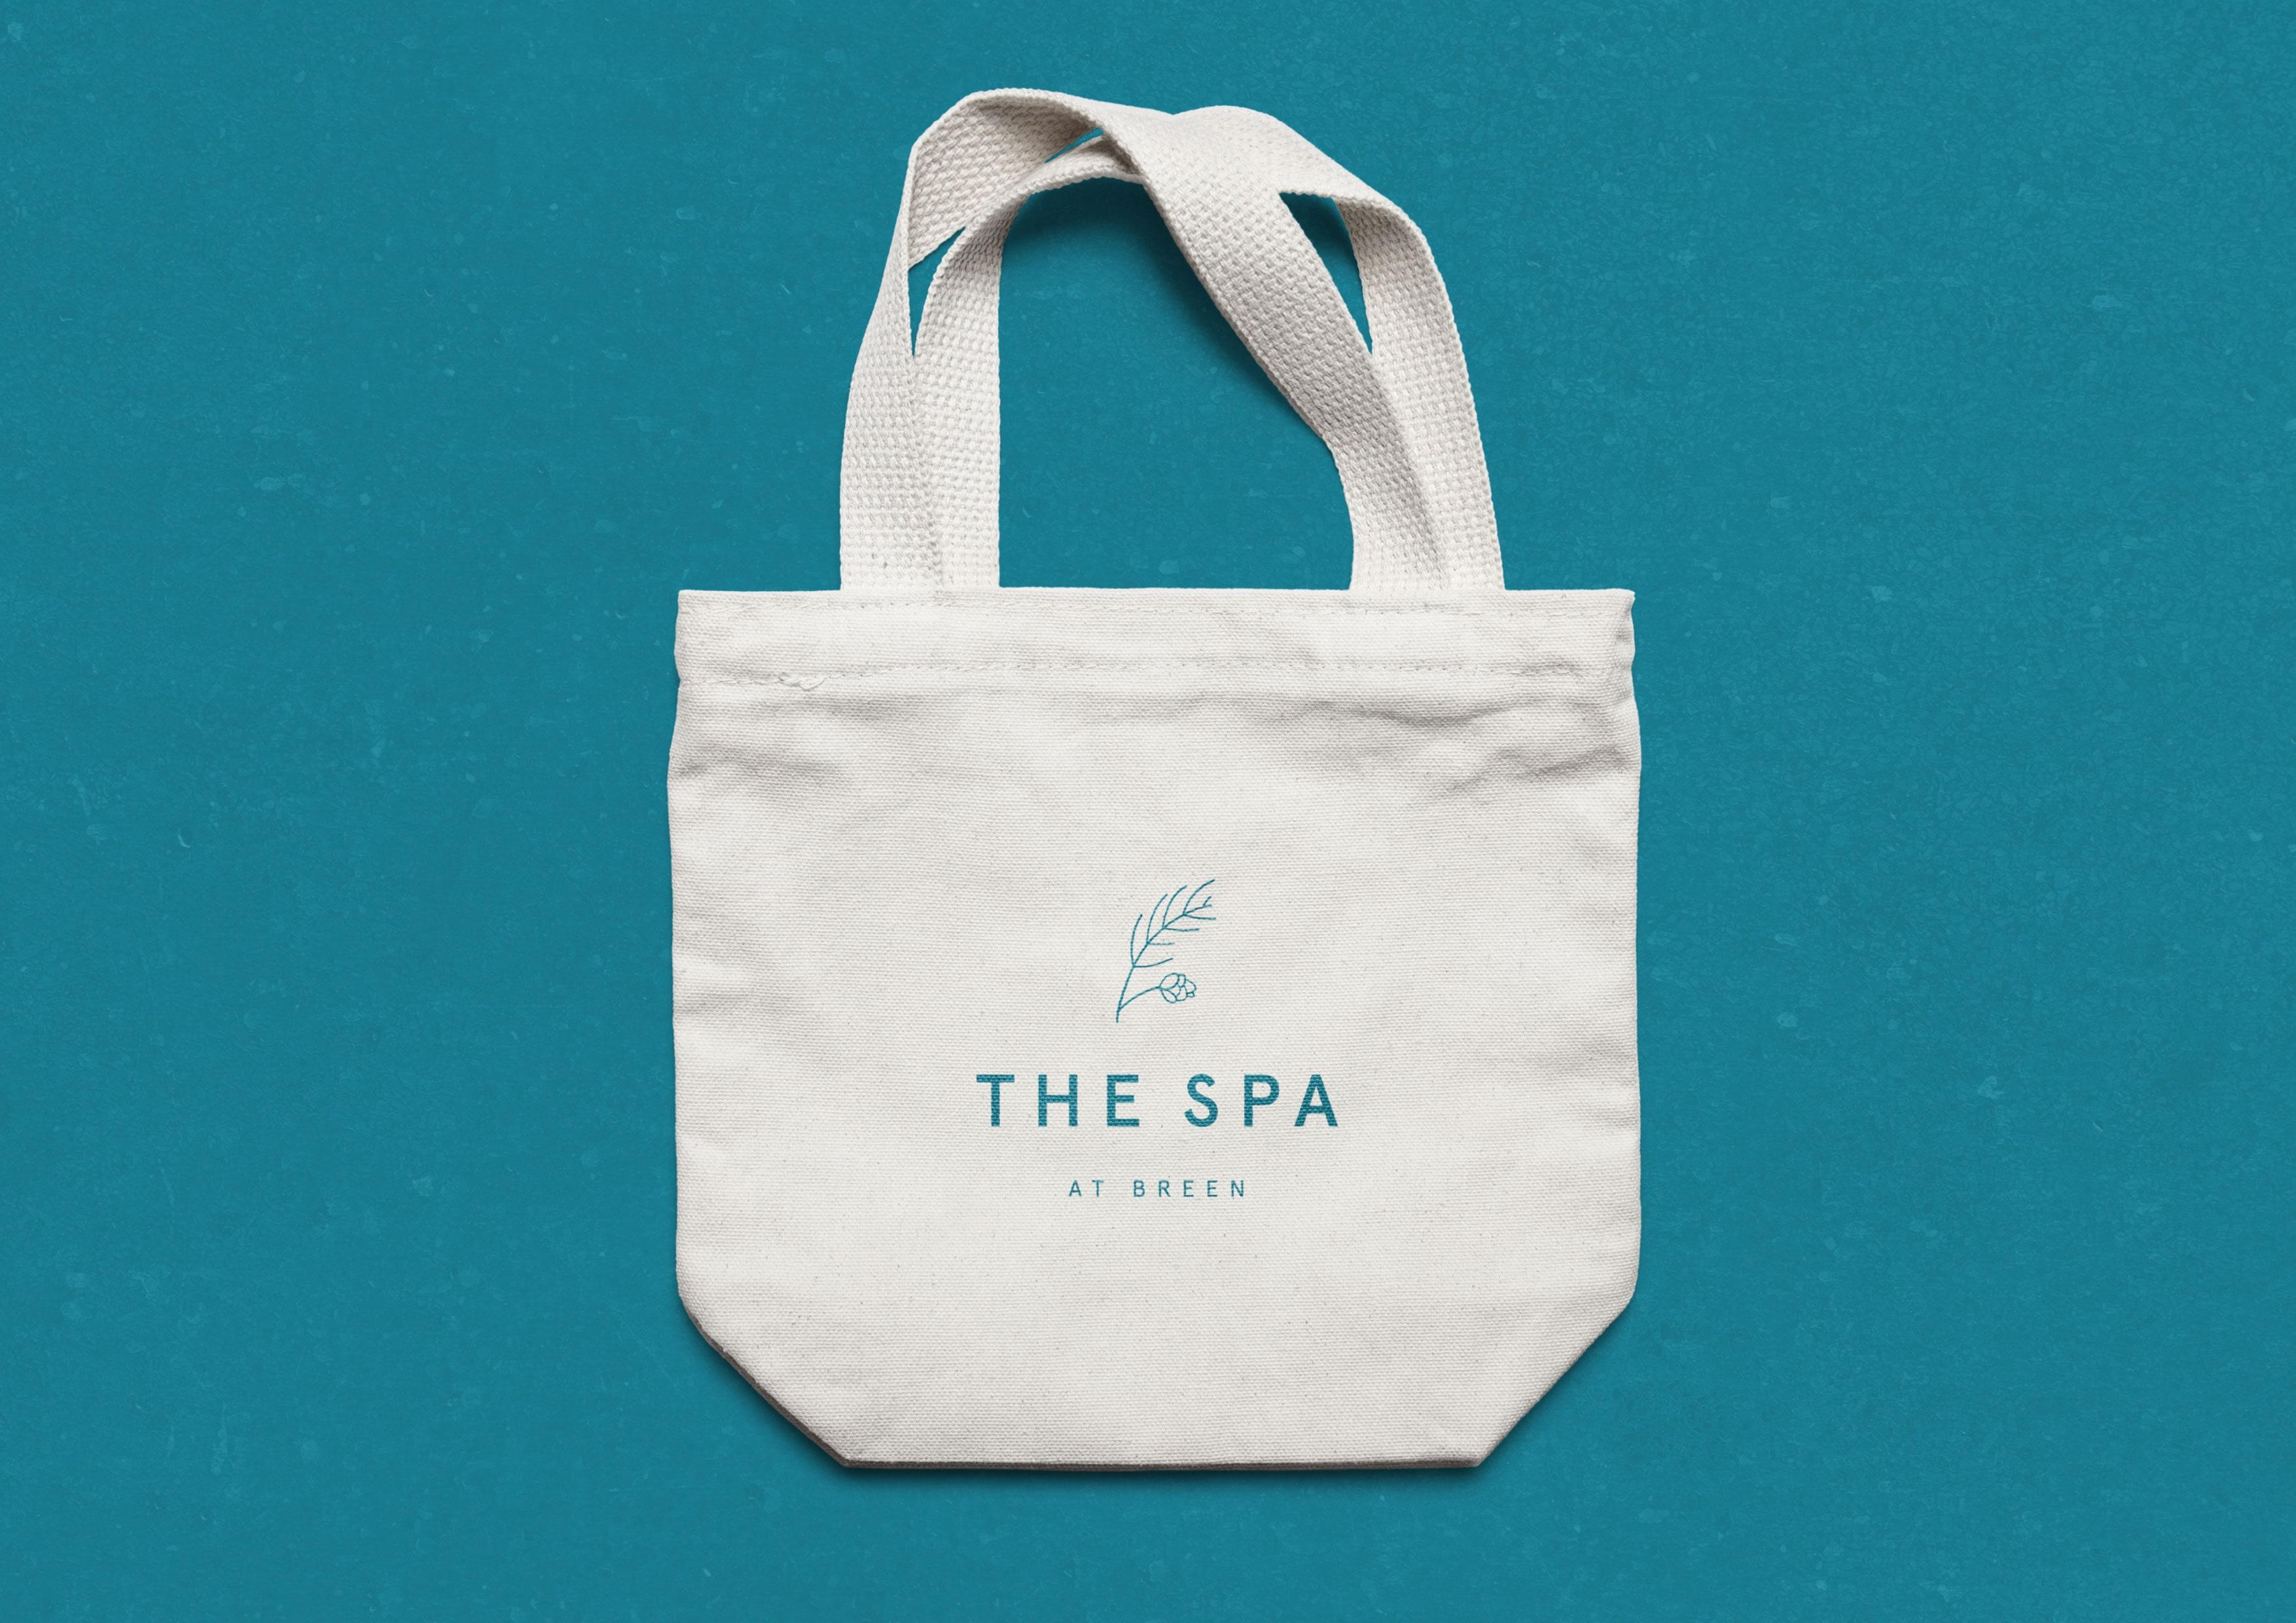 Packaging design for nordic spa, BREEN, designed by Jack Watkins